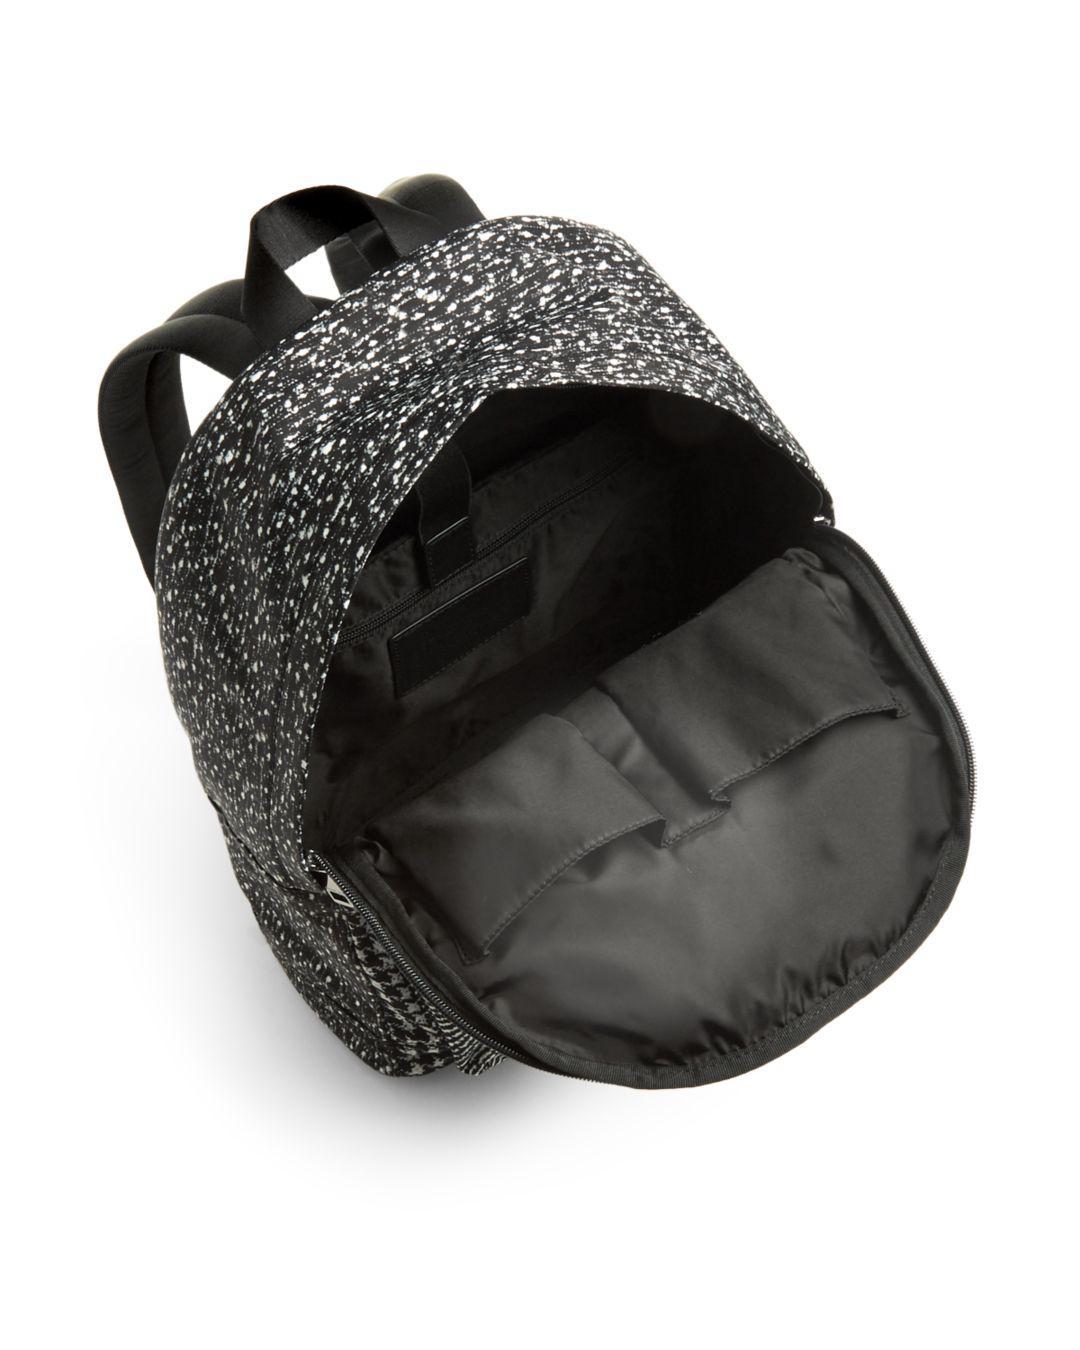 a15715c23e Lyst - Michael Kors Kent Houndstooth Nylon Backpack in Black for Men - Save  60%